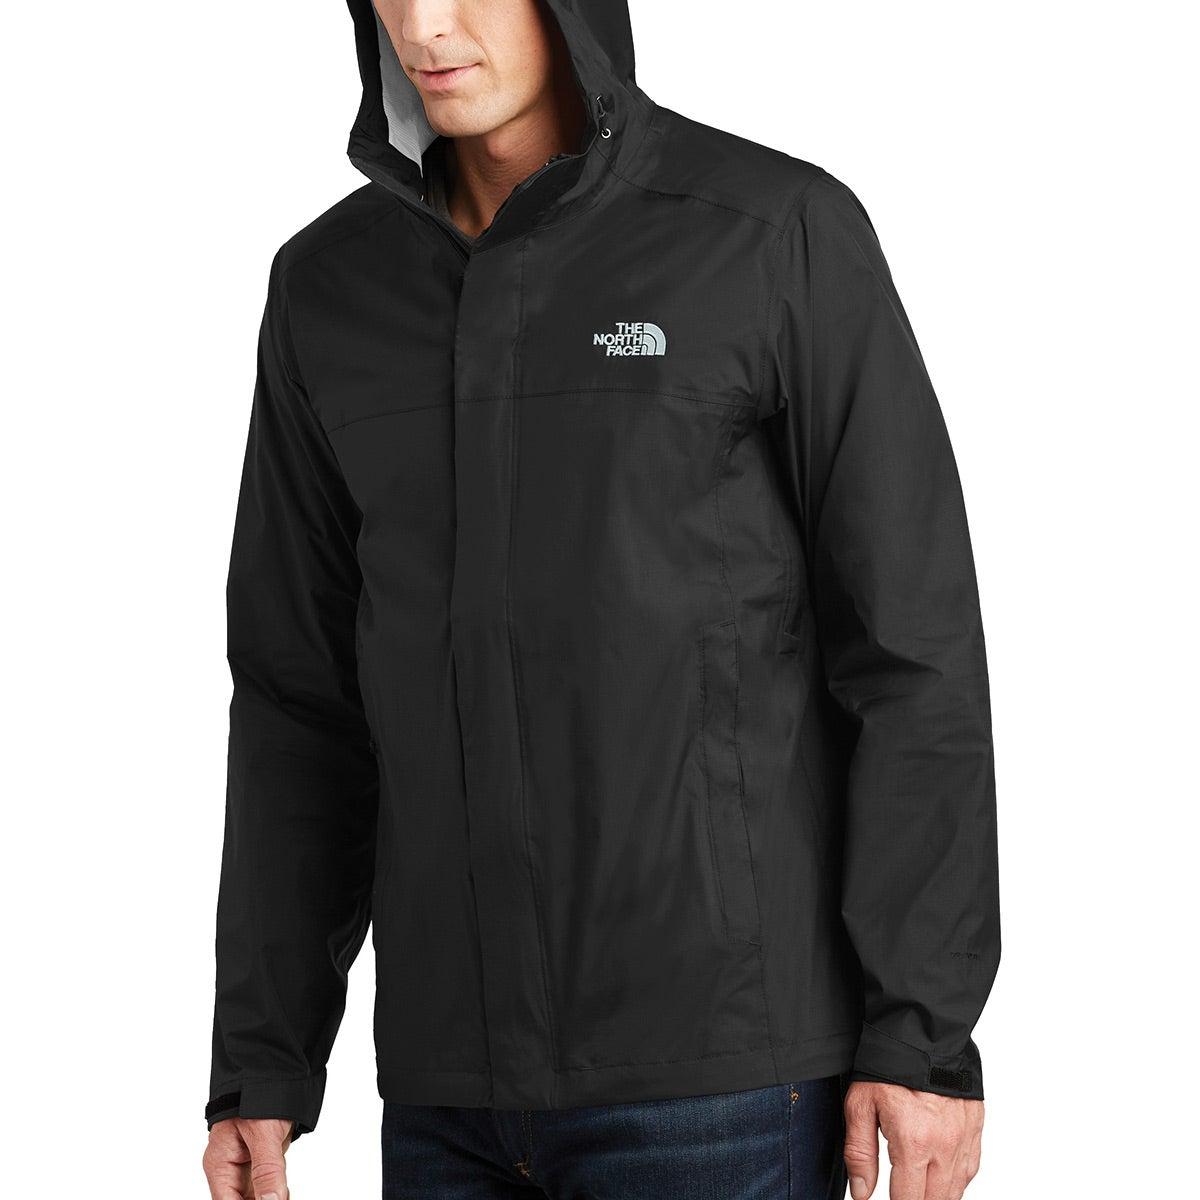 3c2a6ae52bda7 The North Face DryVent Rain Jacket (Men s)